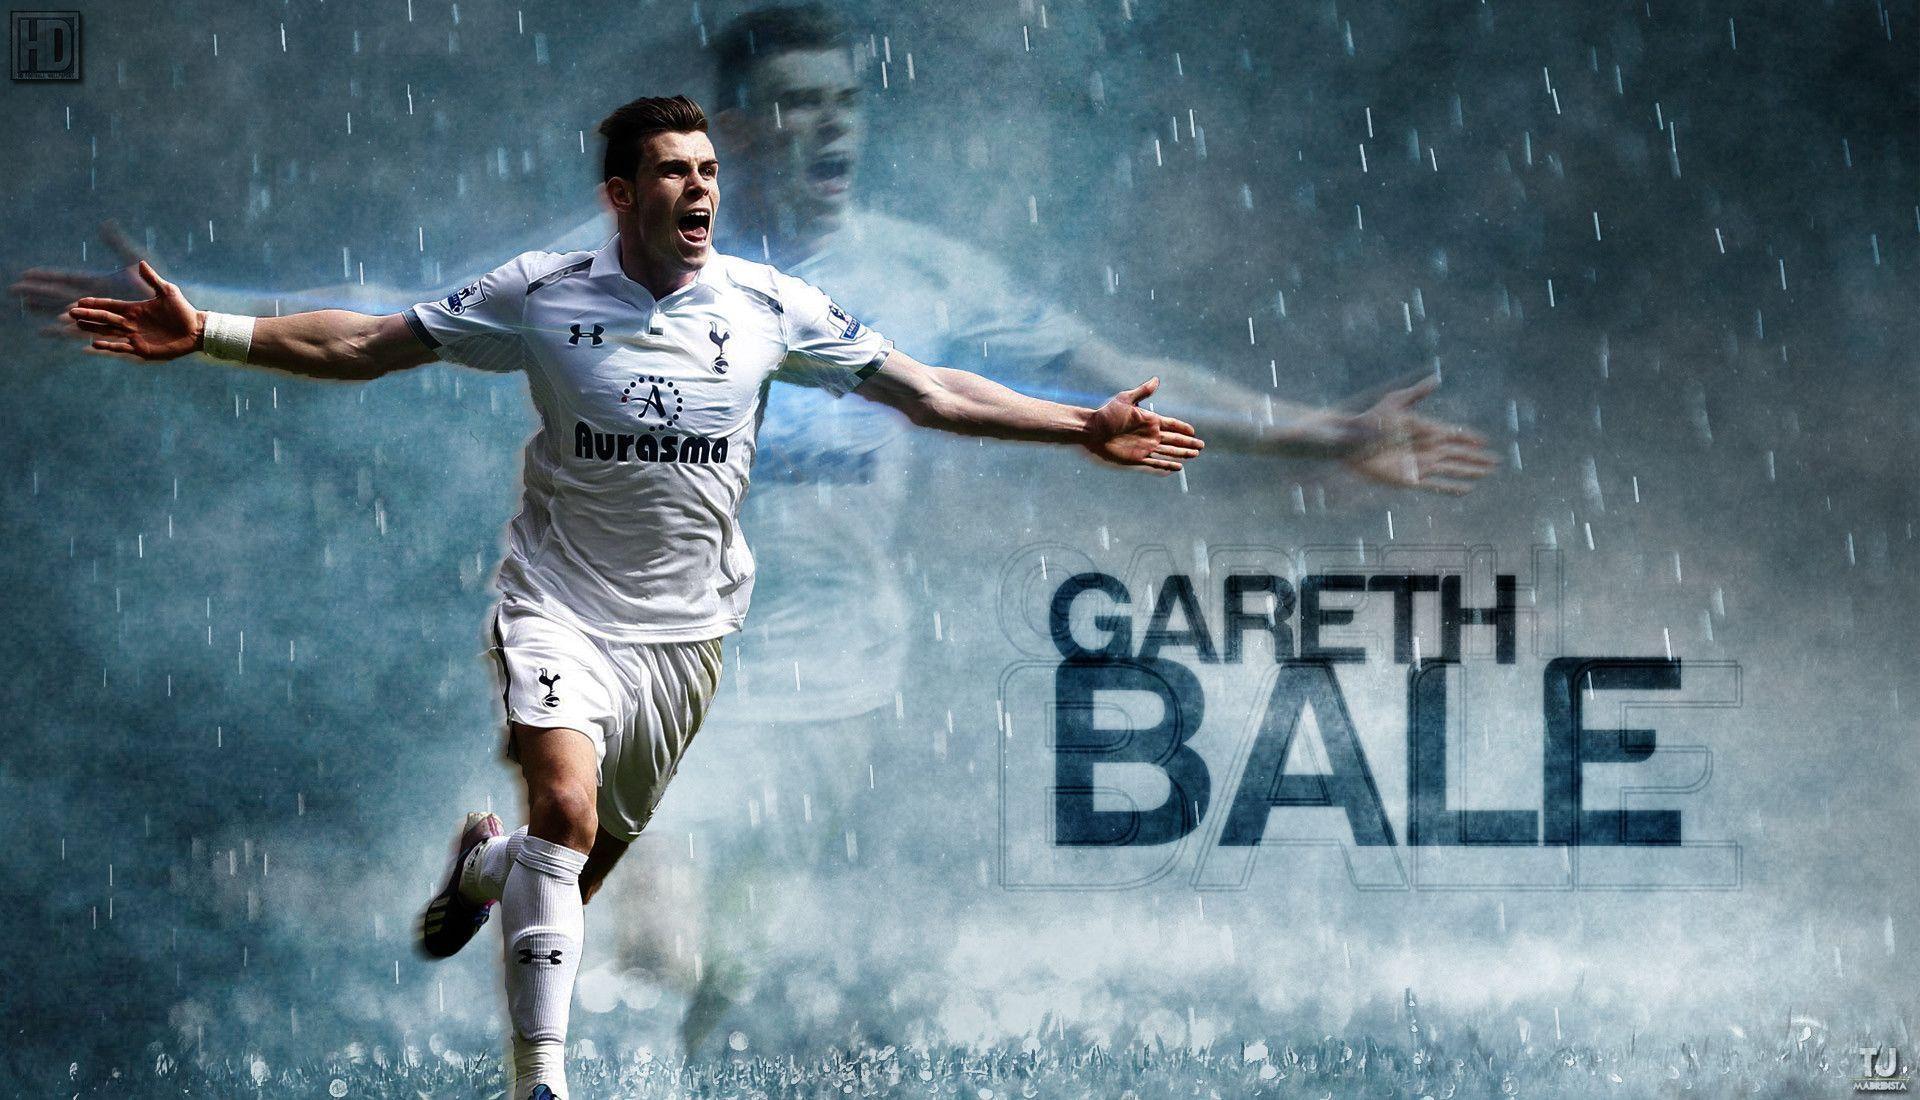 Gareth Bale HD Wallpapers Download Free 2015